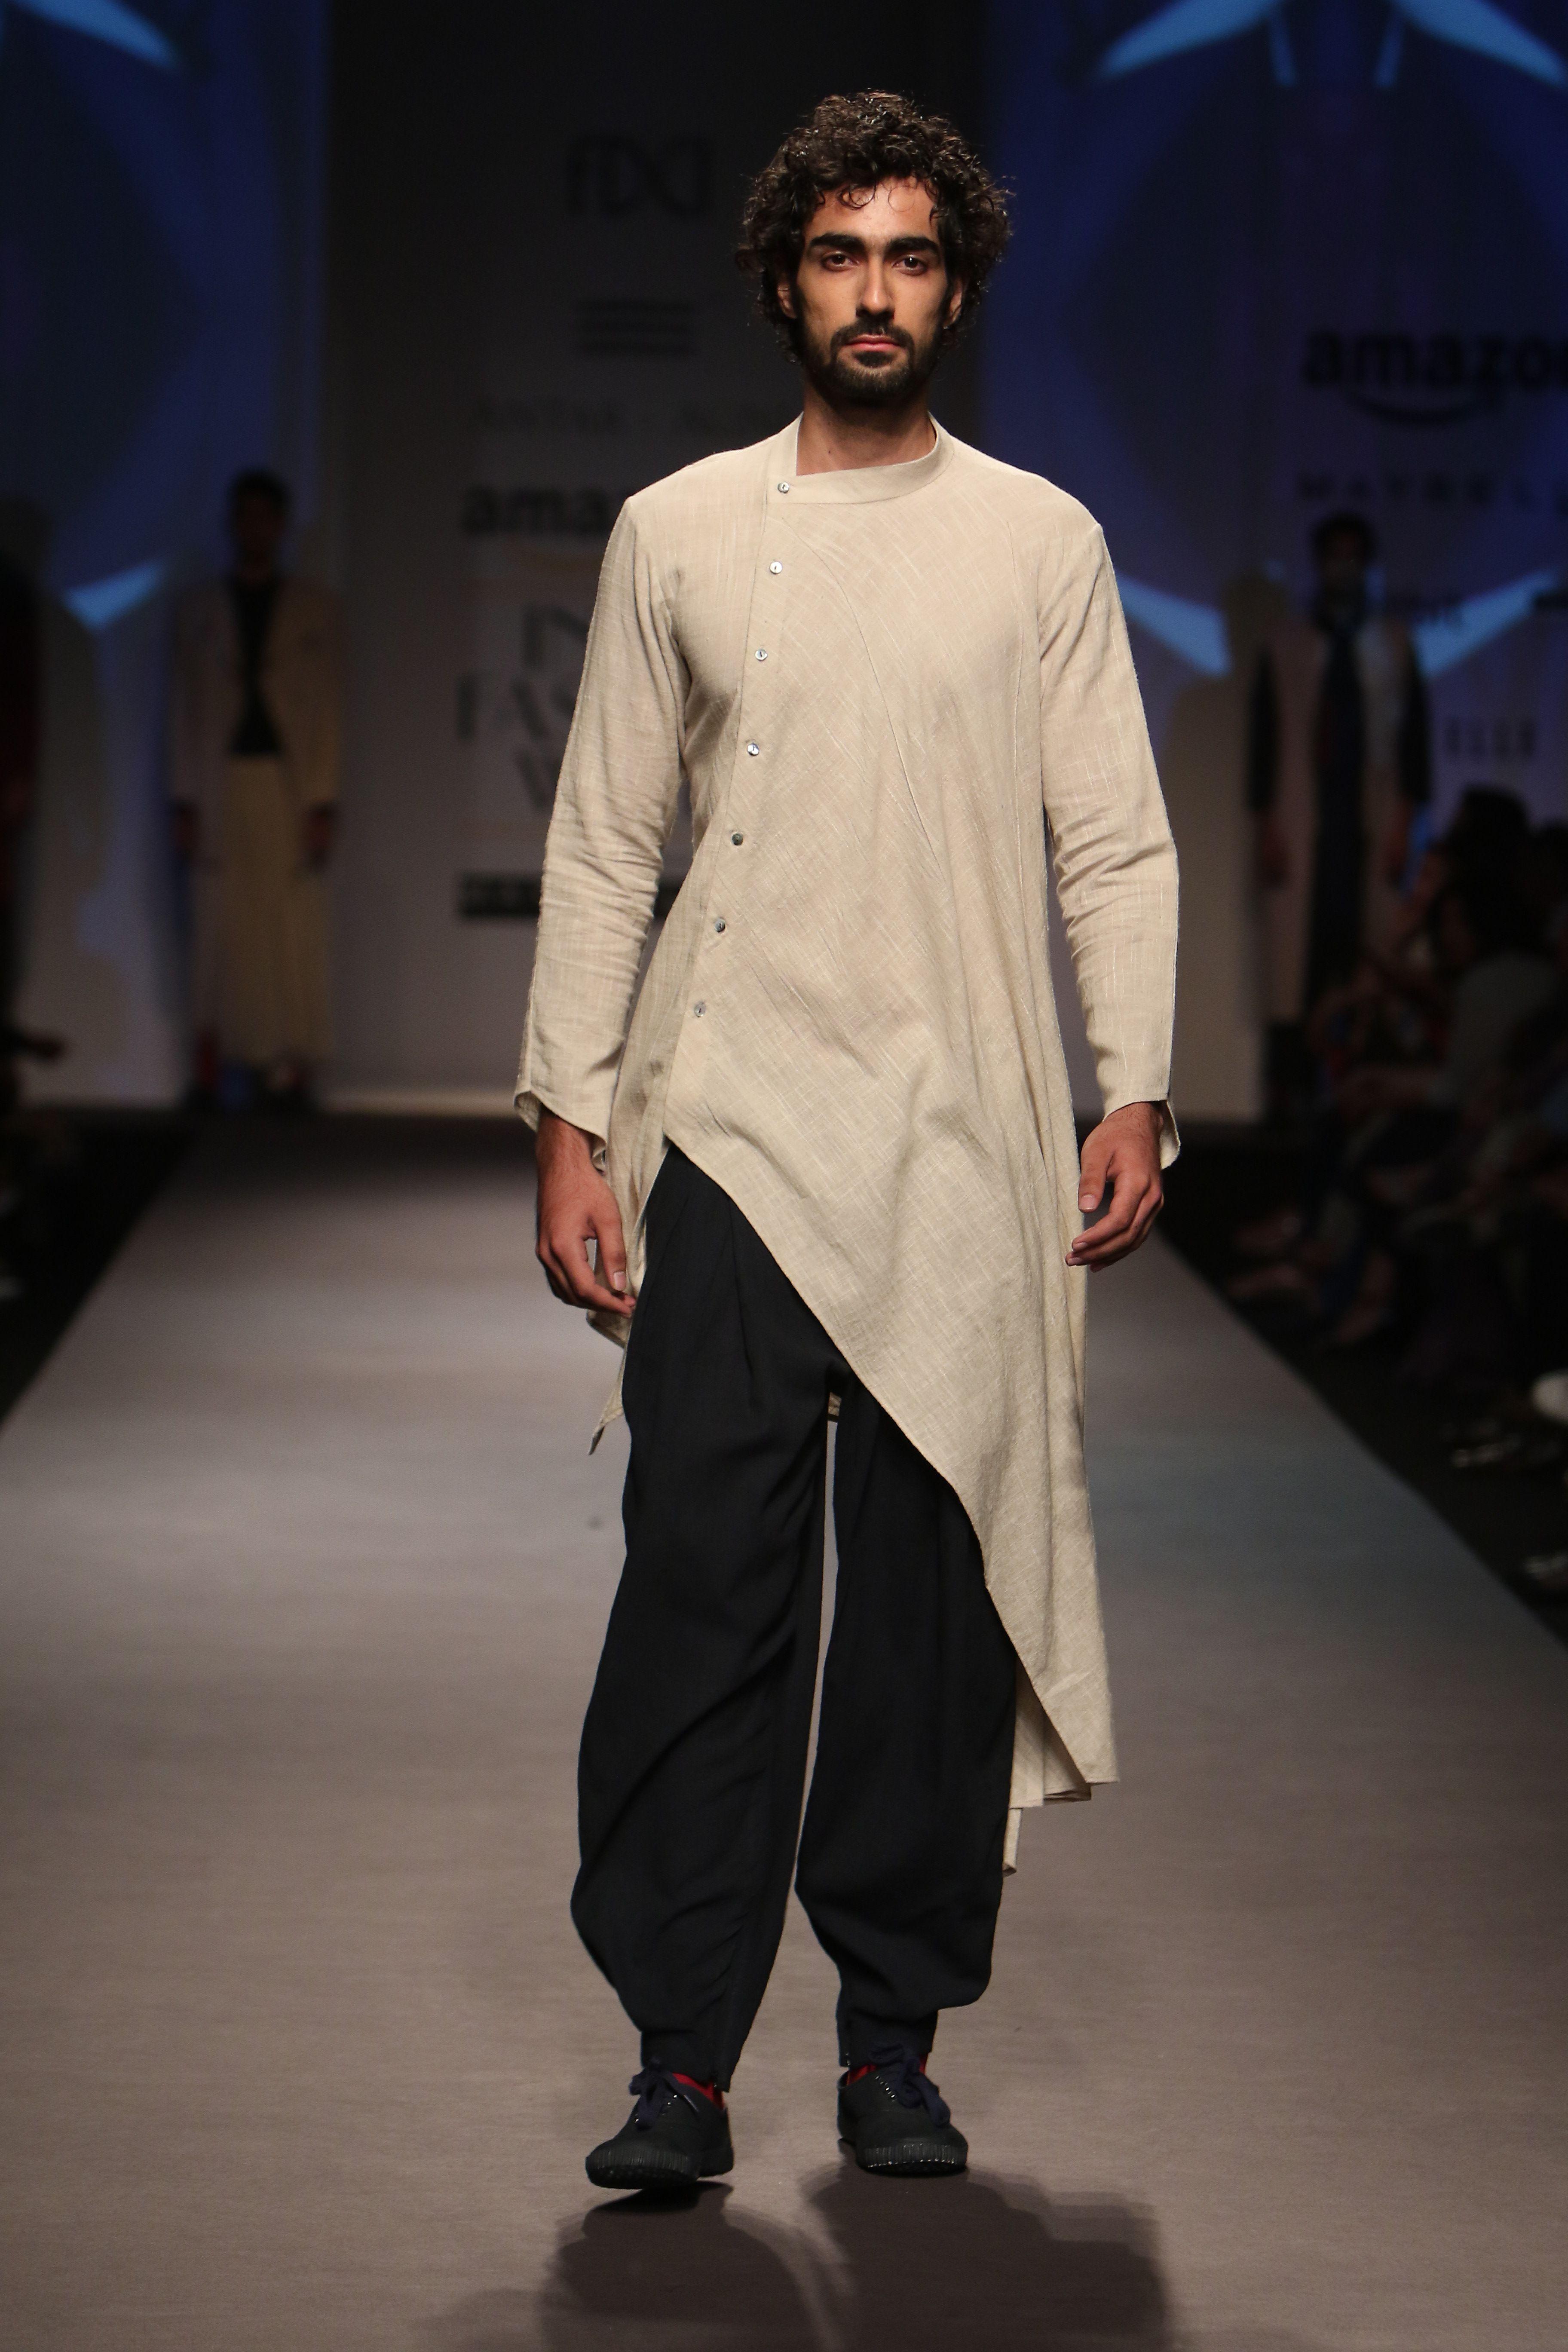 7e6168e9db b7fd6a9e9ae98c8347625745bb35358e.jpg (3648×5472) India Fashion, Indian Men  Fashion, Mens